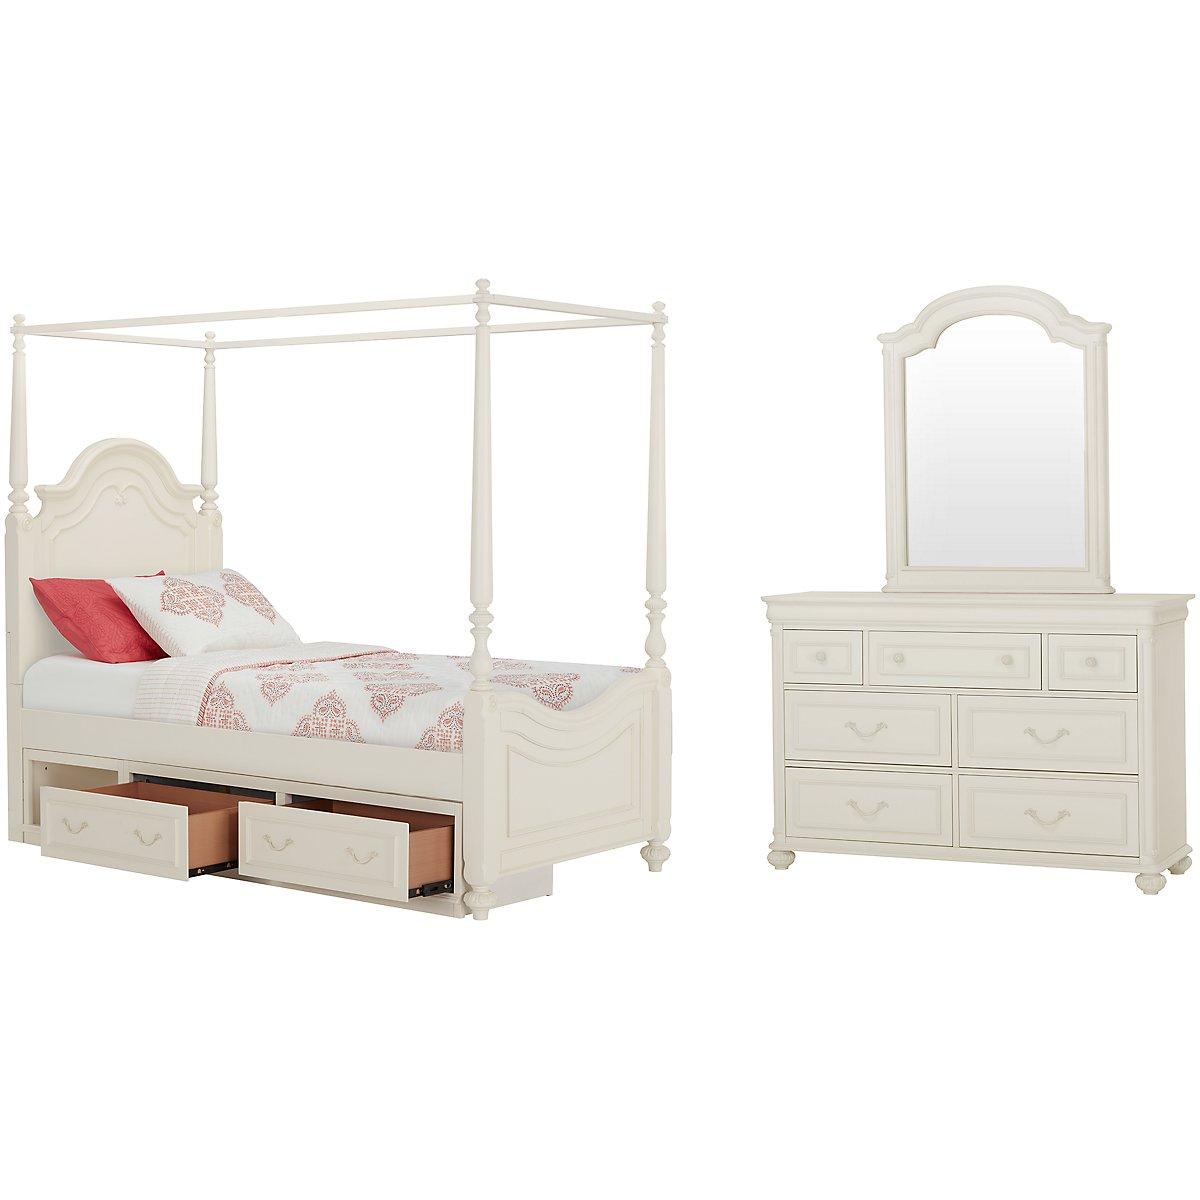 Charlotte Ivory Canopy Storage Bedroom